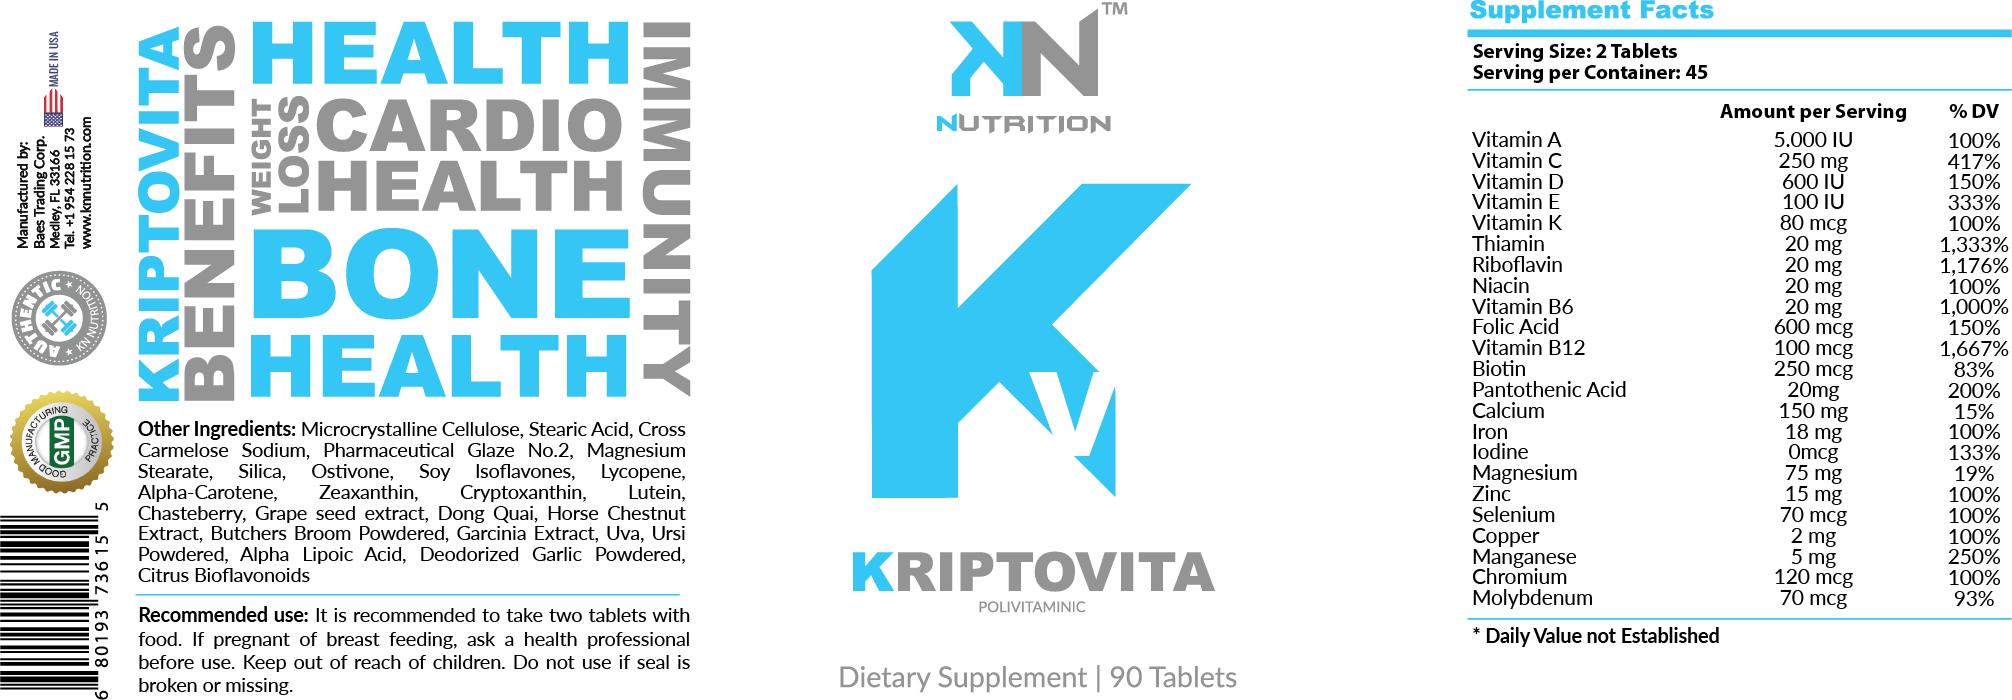 banner-kriptovita-kn-nutrition-primo-suplementos